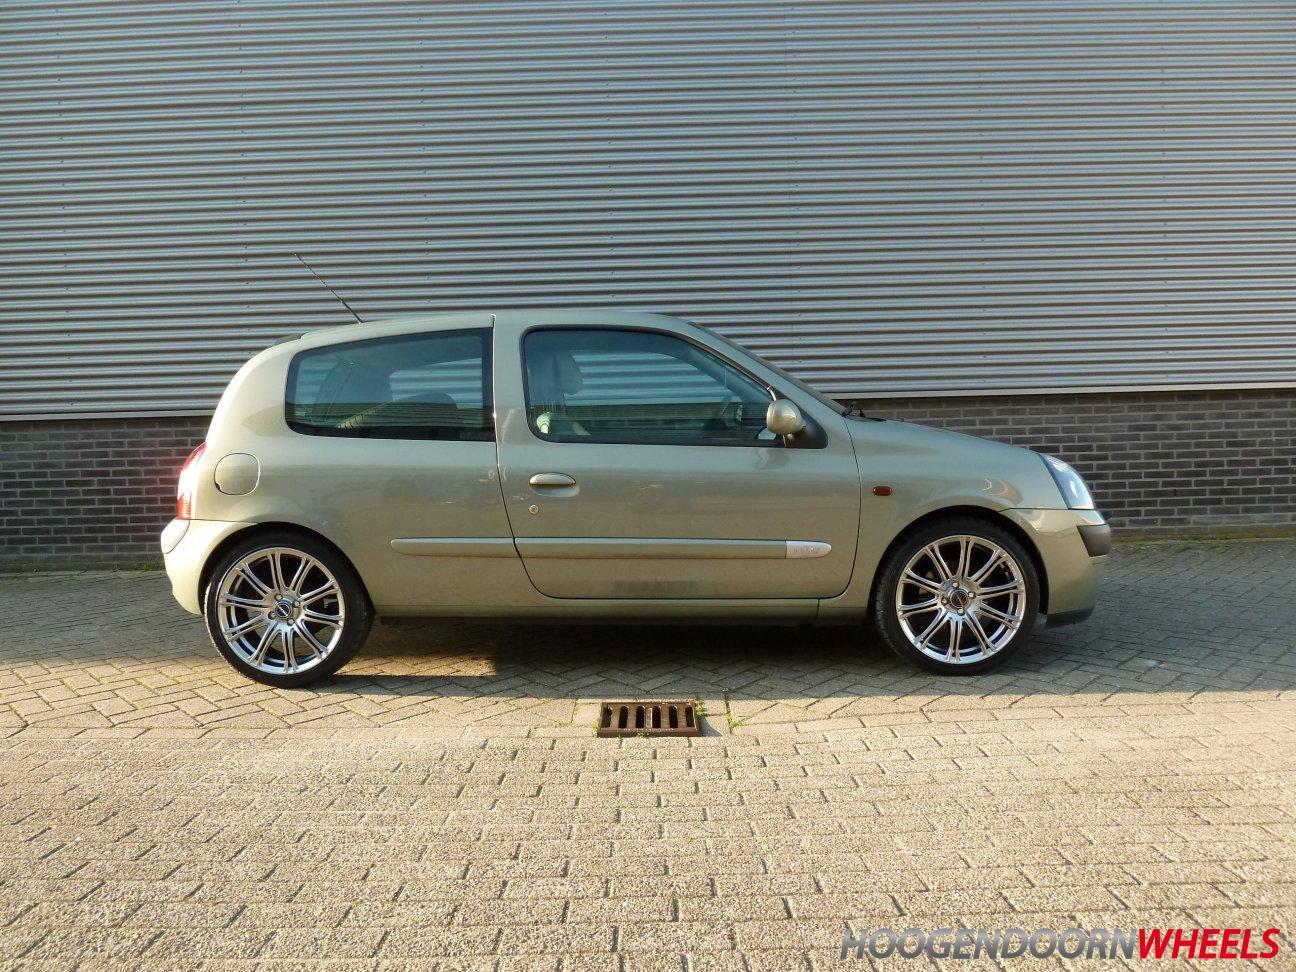 Renault Clio Ii Iii Bb012 Cb012 Br01 Cr01